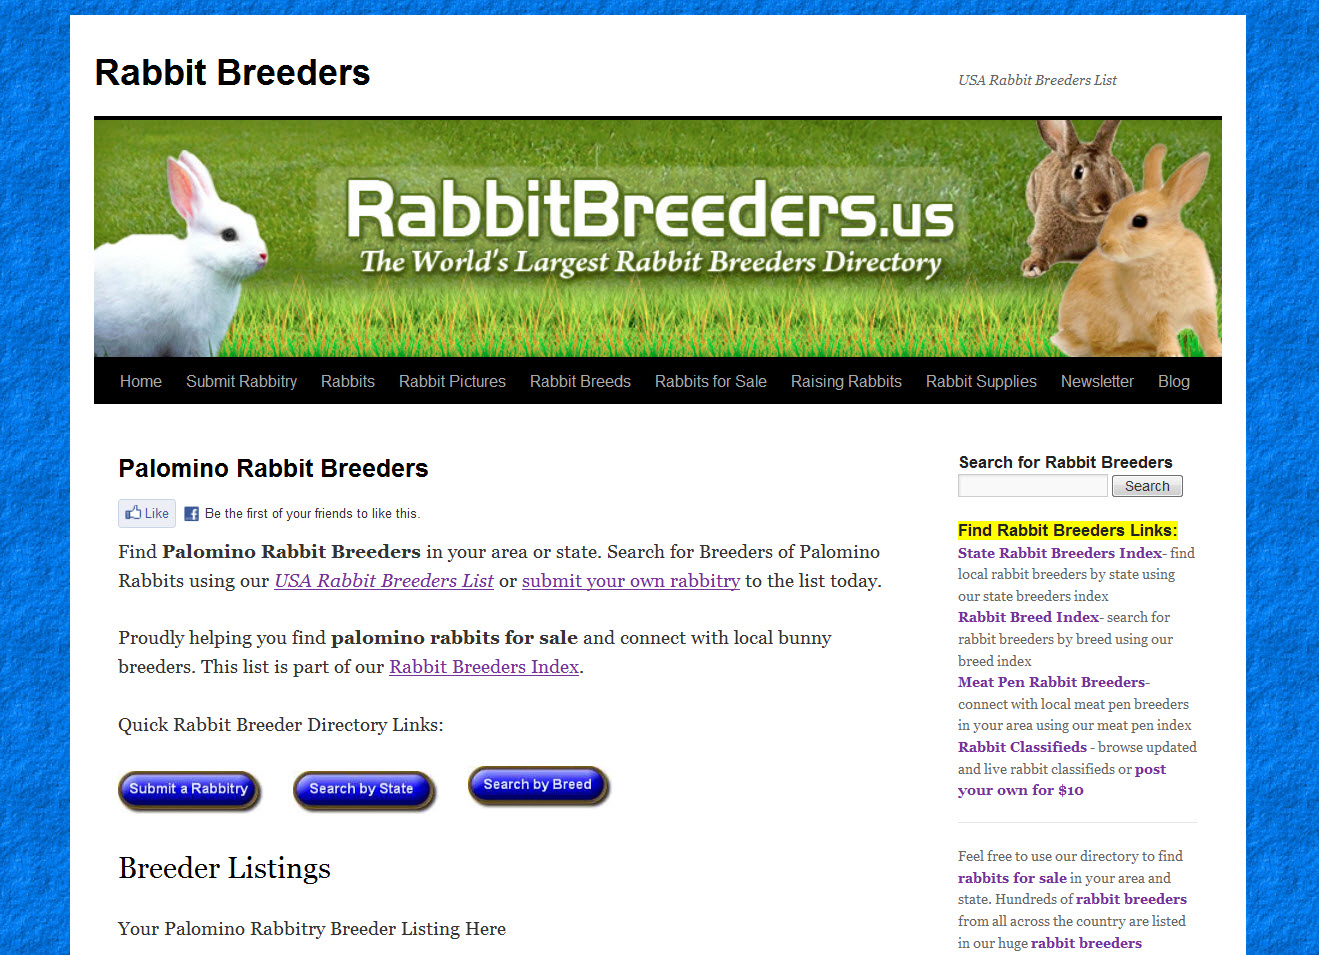 Palomino Rabbit Breeders